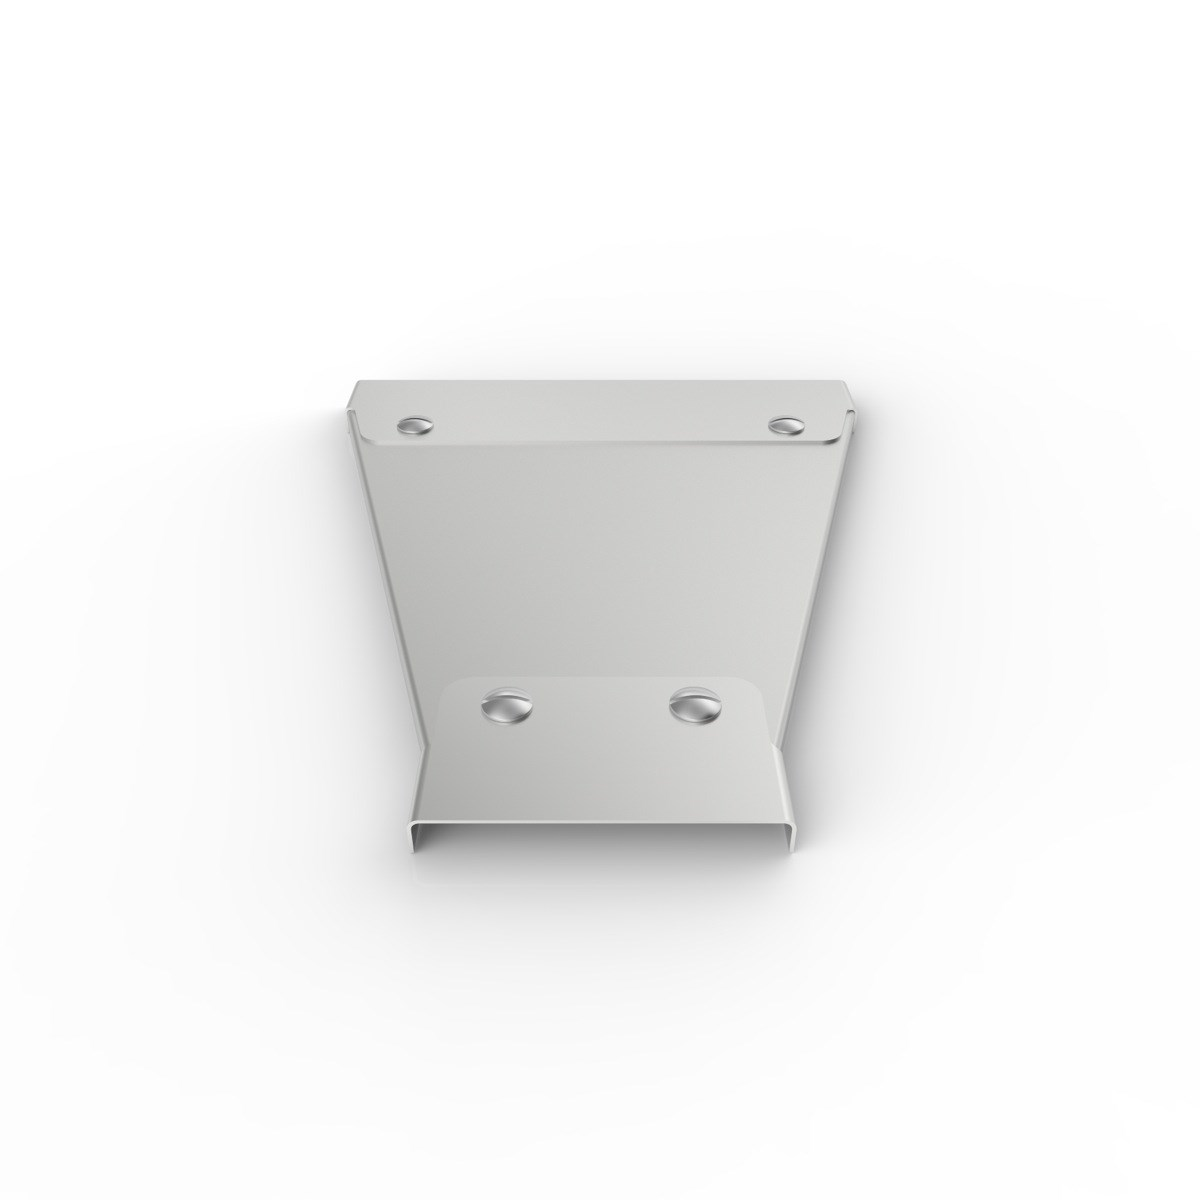 Electrix Mrf Re450 150 Lid Medium Duty Return Flange